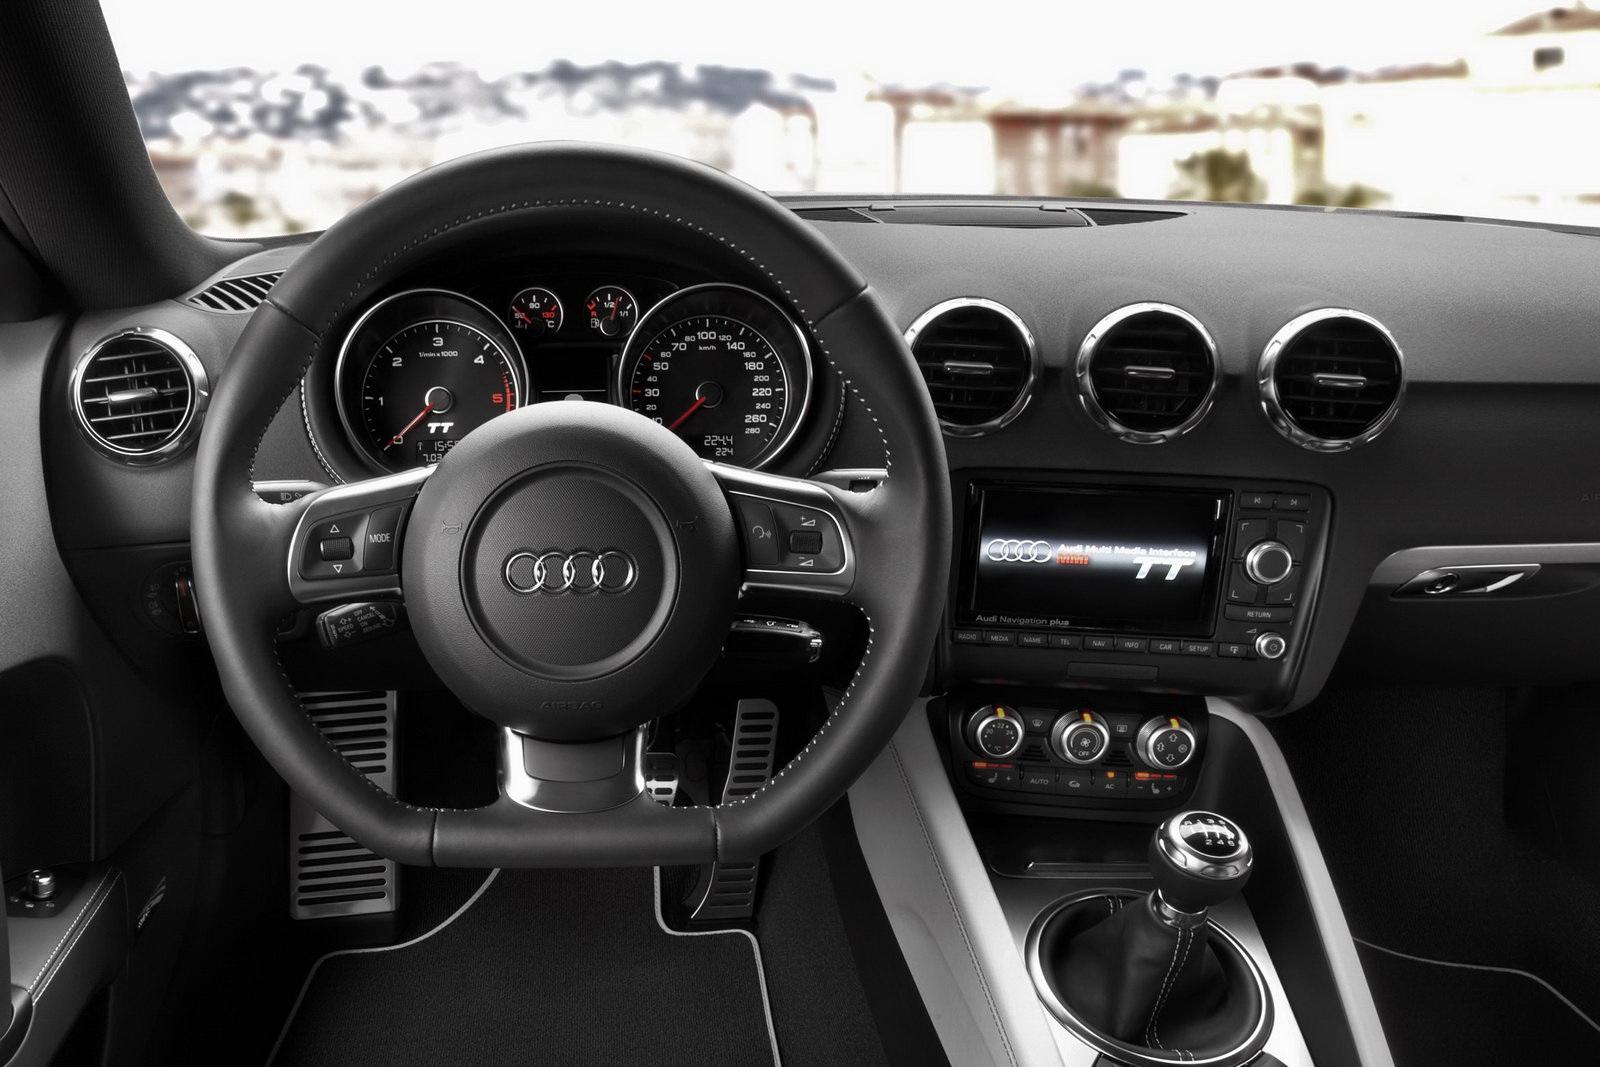 Audi TTS II (8J) Restyling 2010 - 2014 Roadster #2